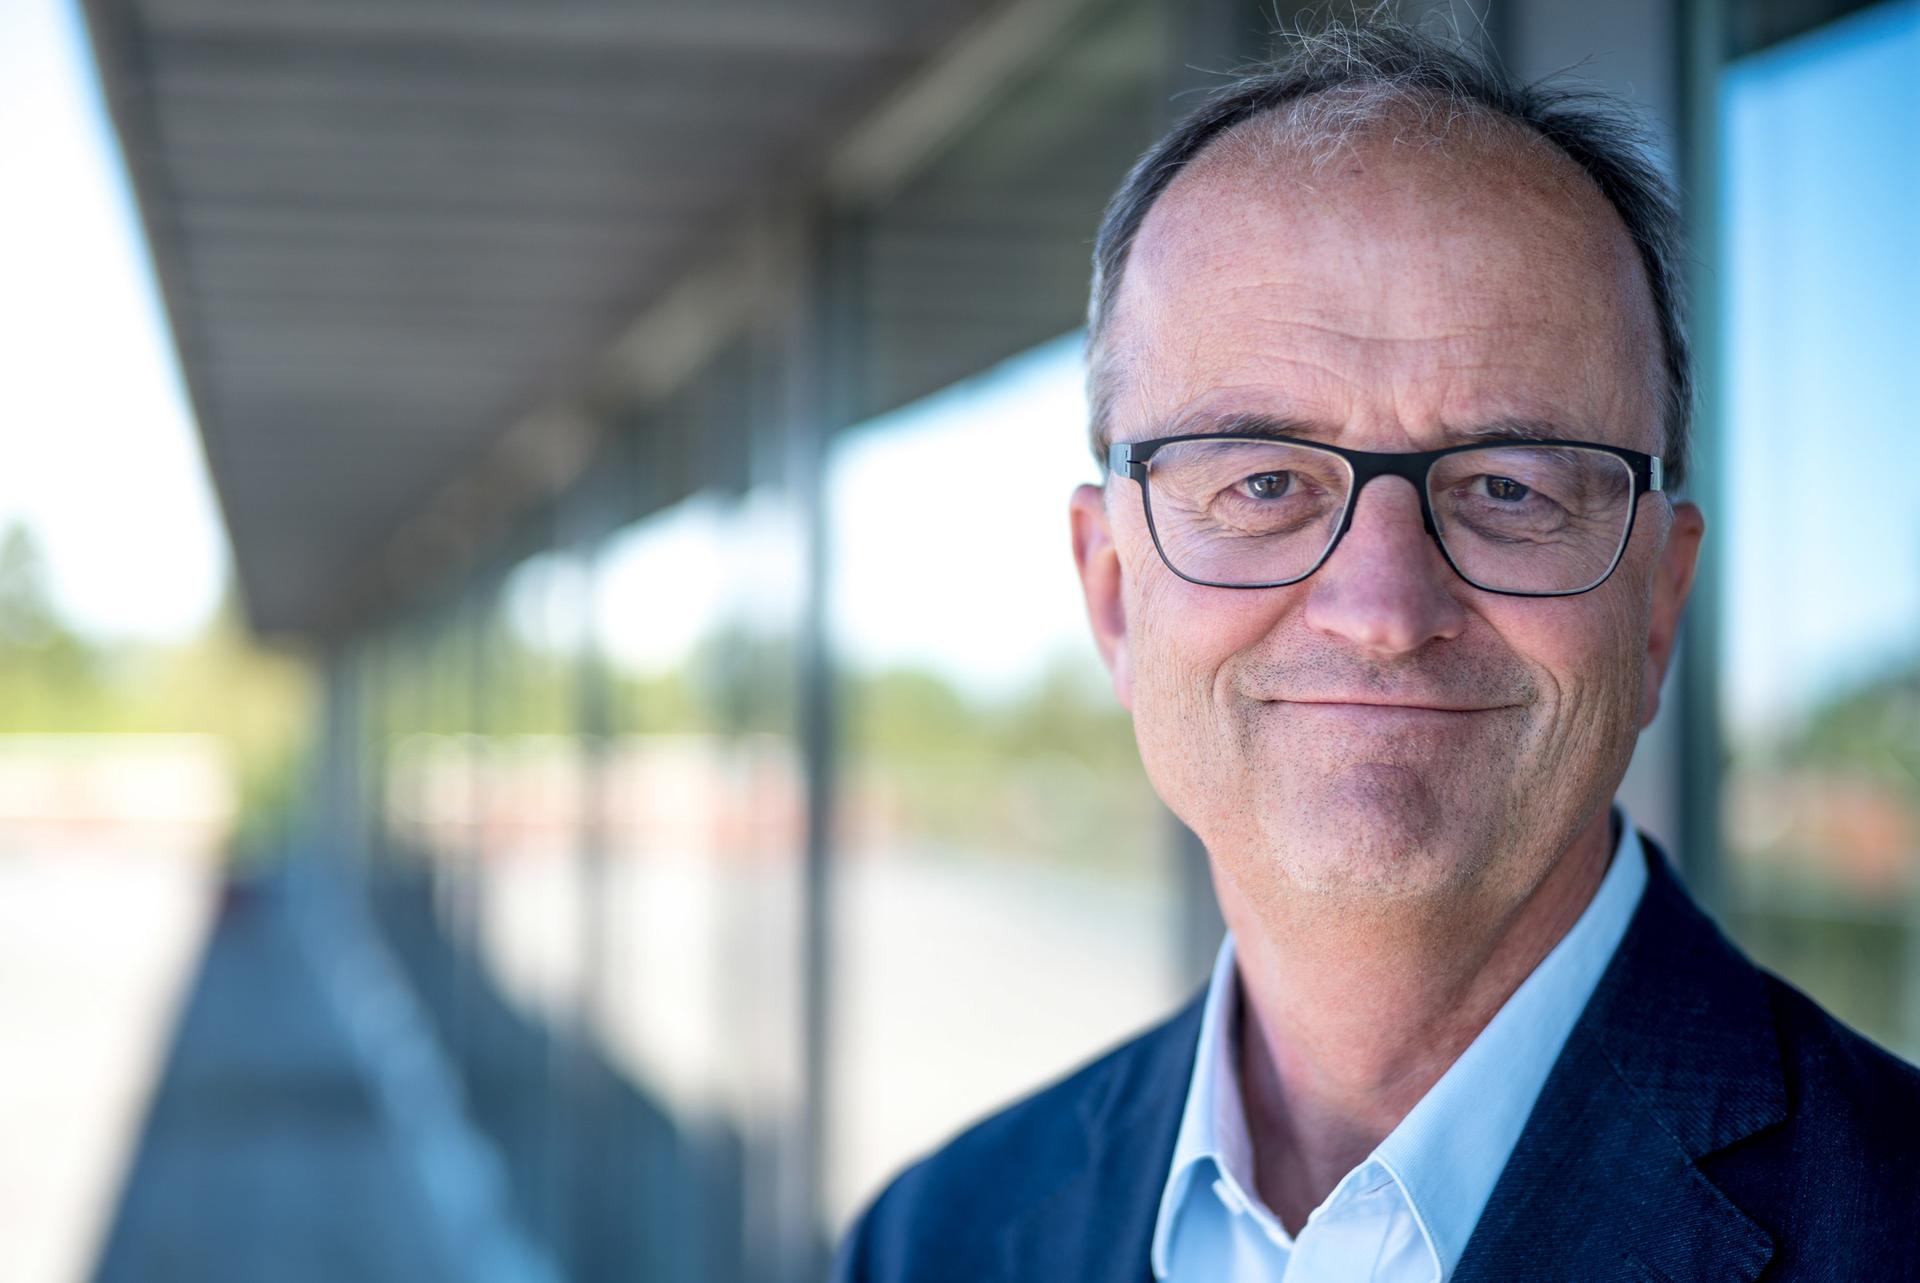 Konsernsjef i Lyse, Eimund Nygaard.